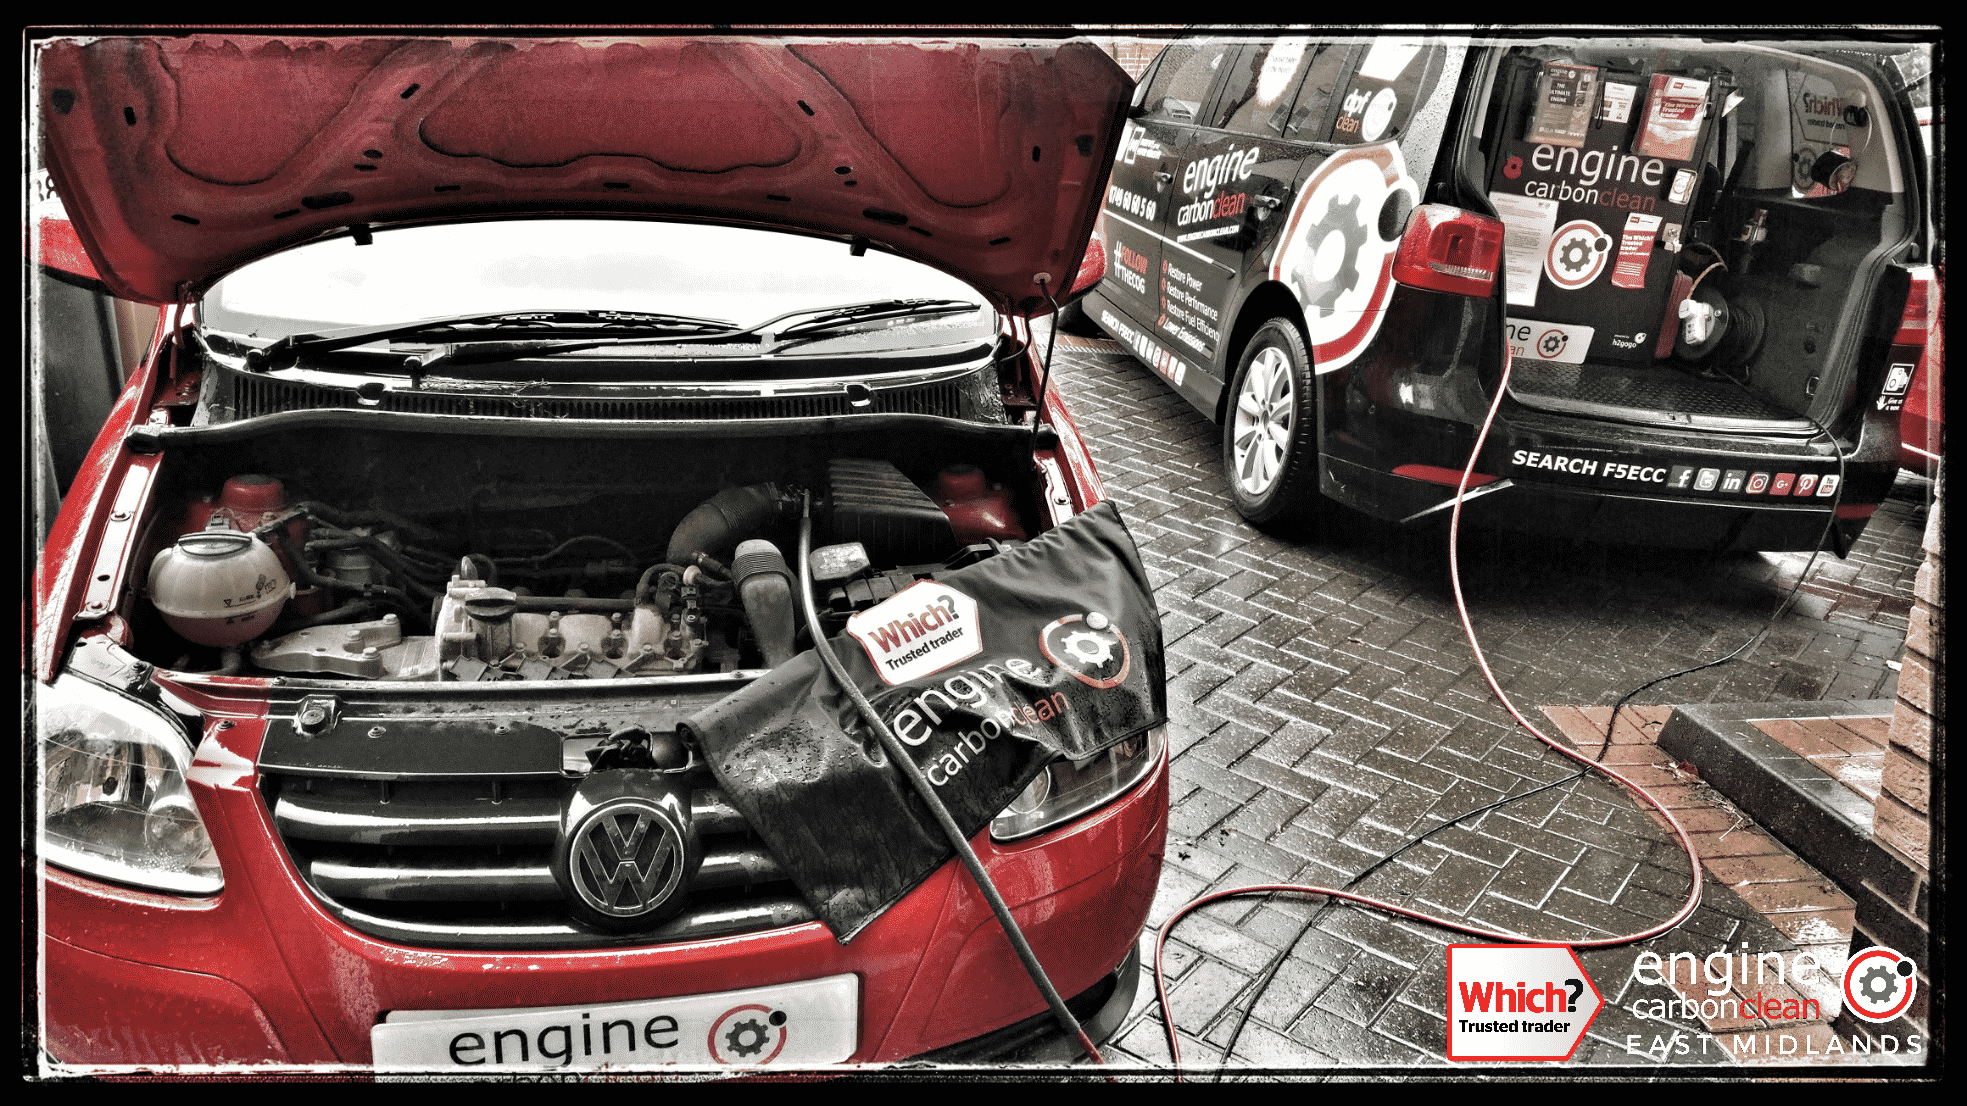 Engine Carbon Clean on a VW Fox petrol (2011 - 34,486 miles)